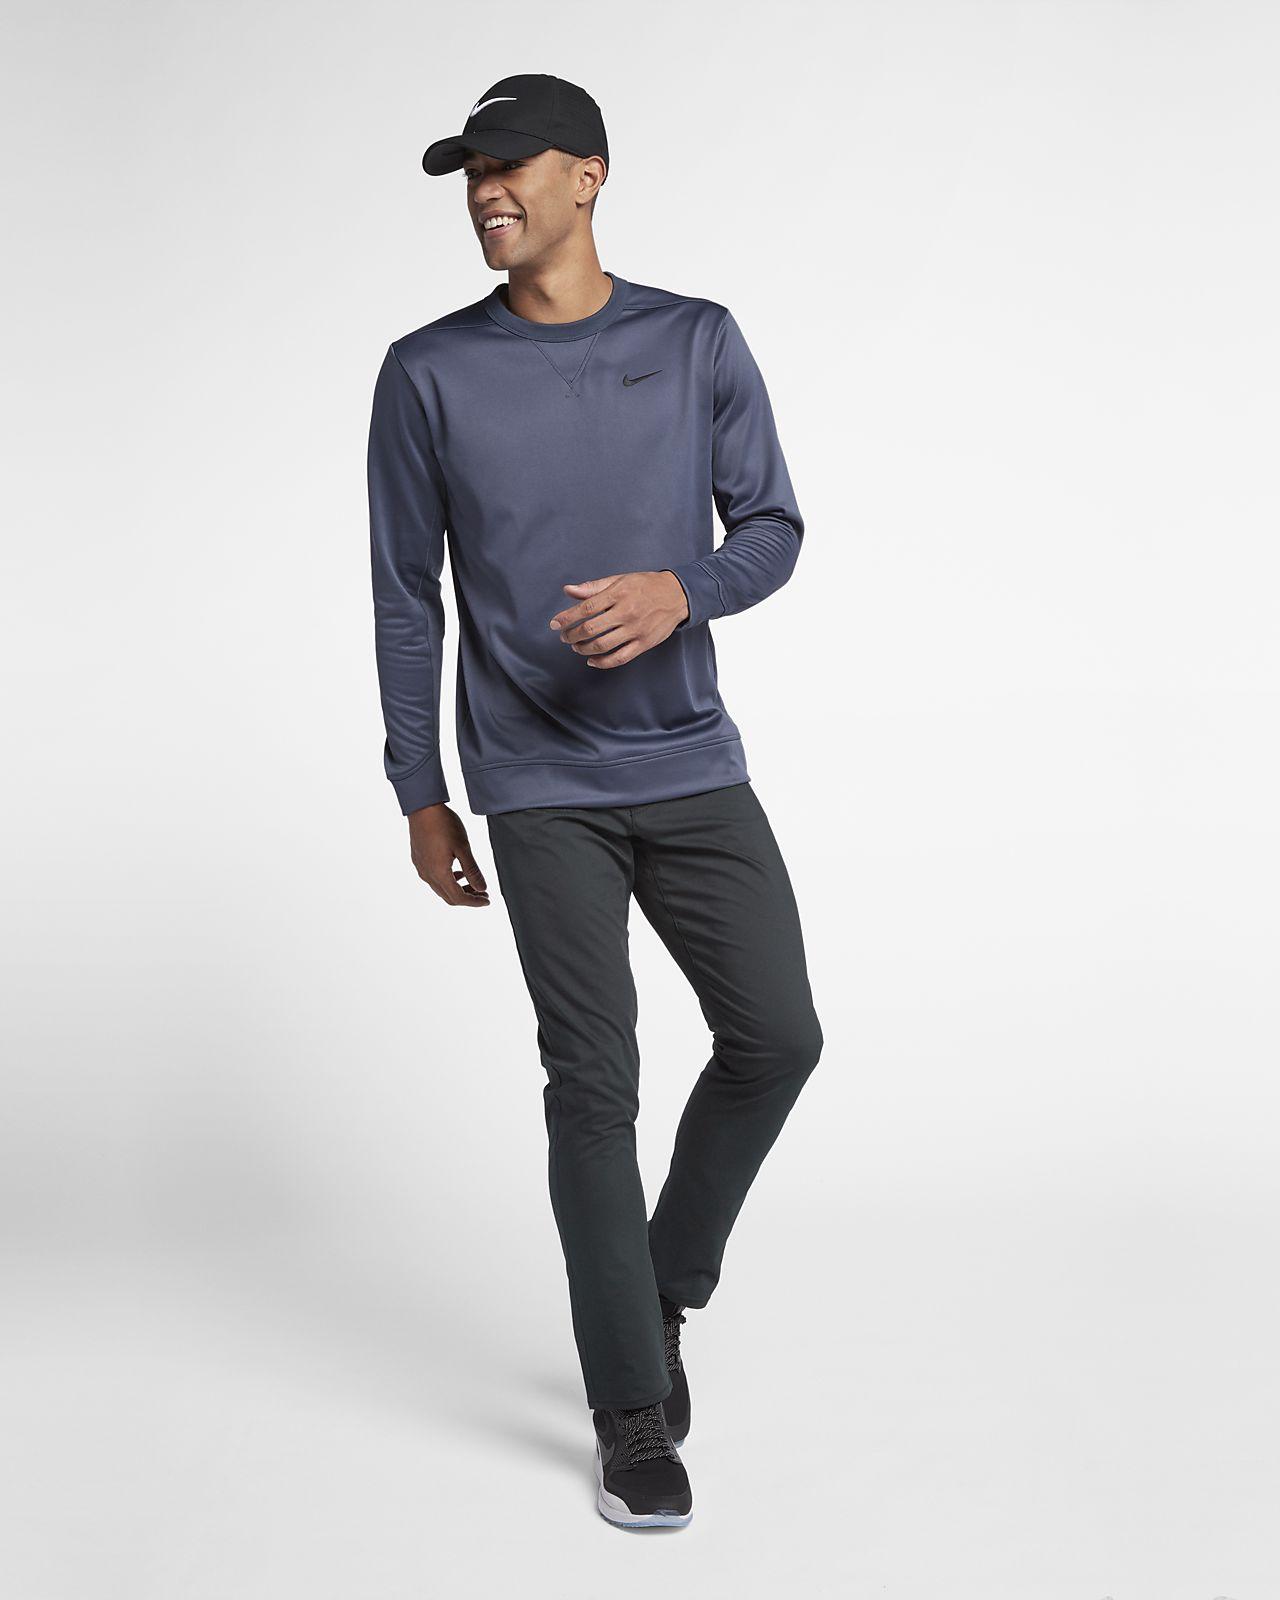 Nike Flex 5 Pocket Herren Golfhose in schmaler Passform